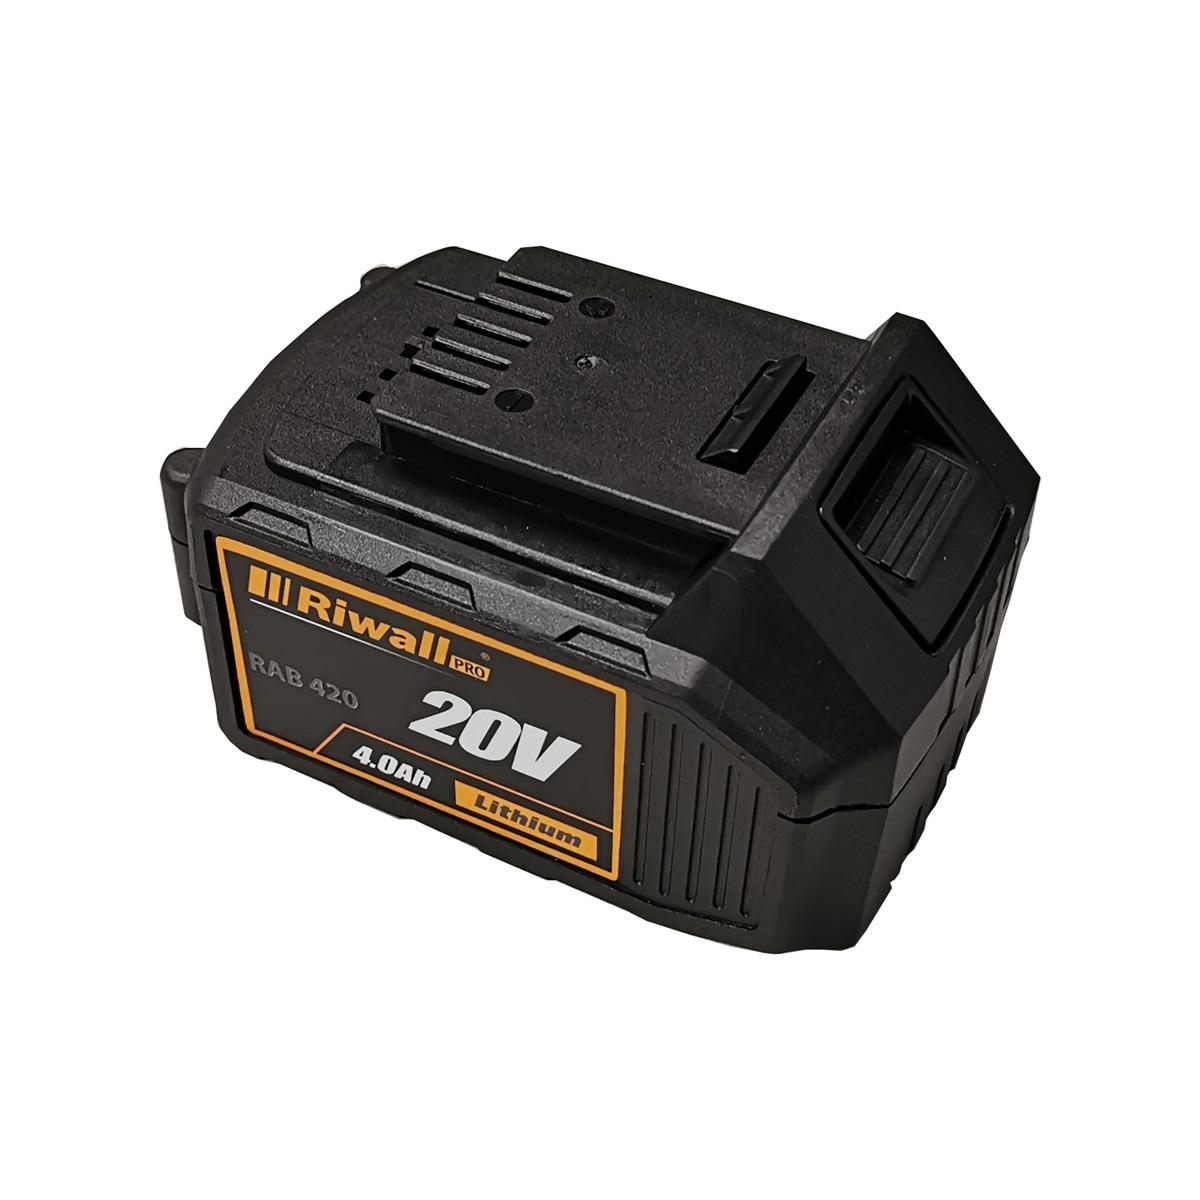 Riwall PRO RAB 420bateria 20 V (4 Ah)